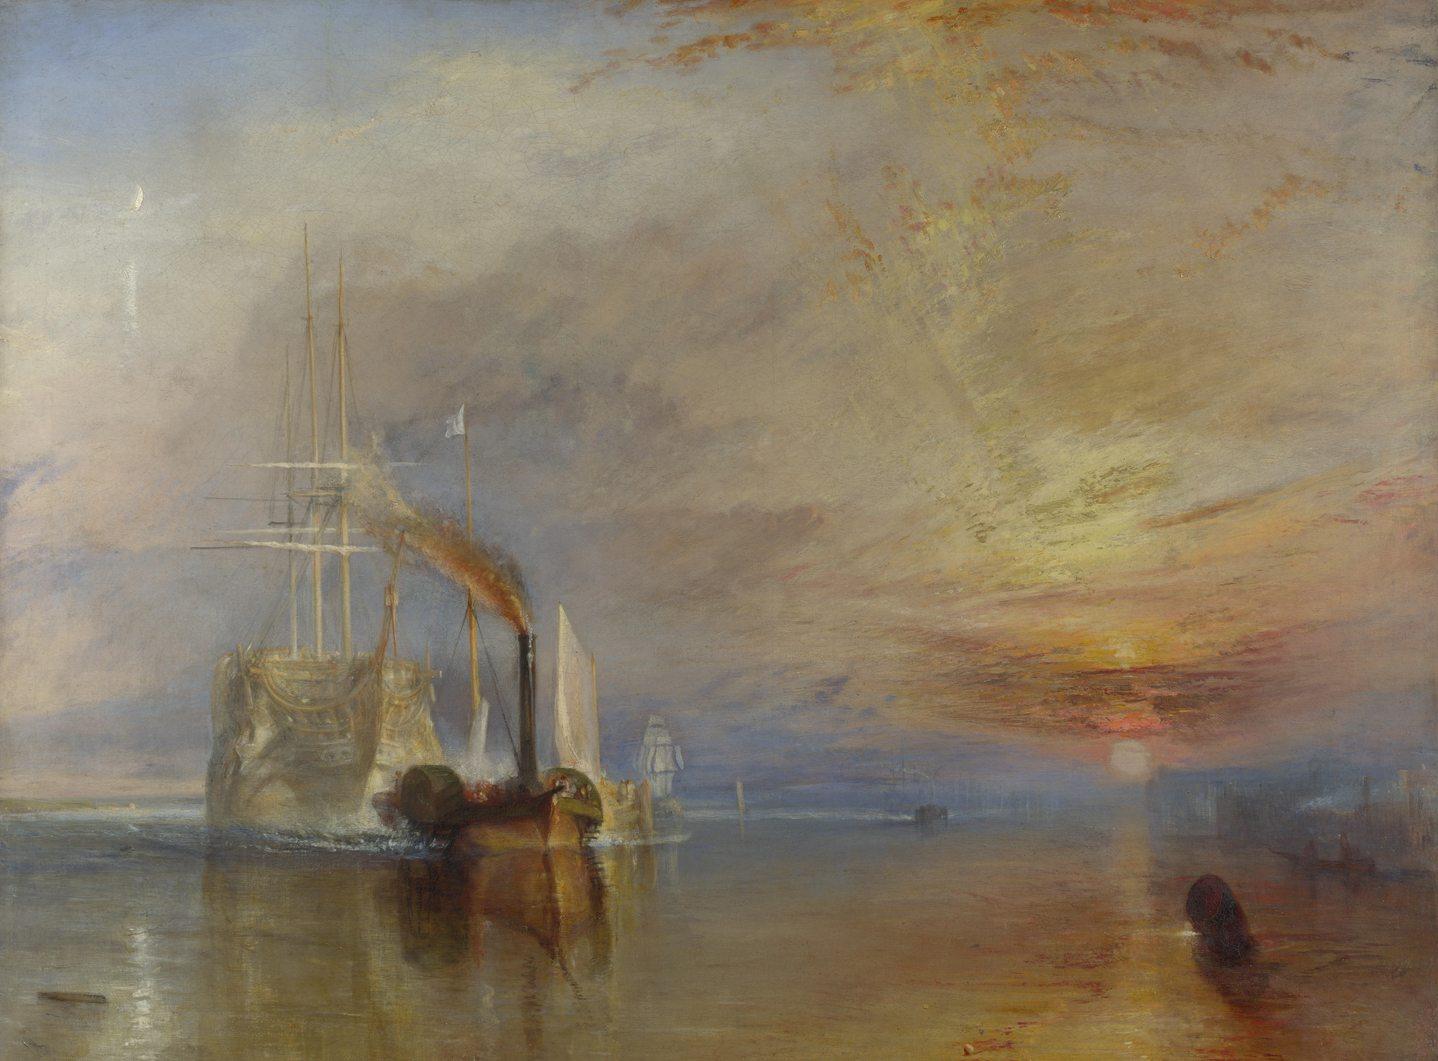 Tableaux de William Turner